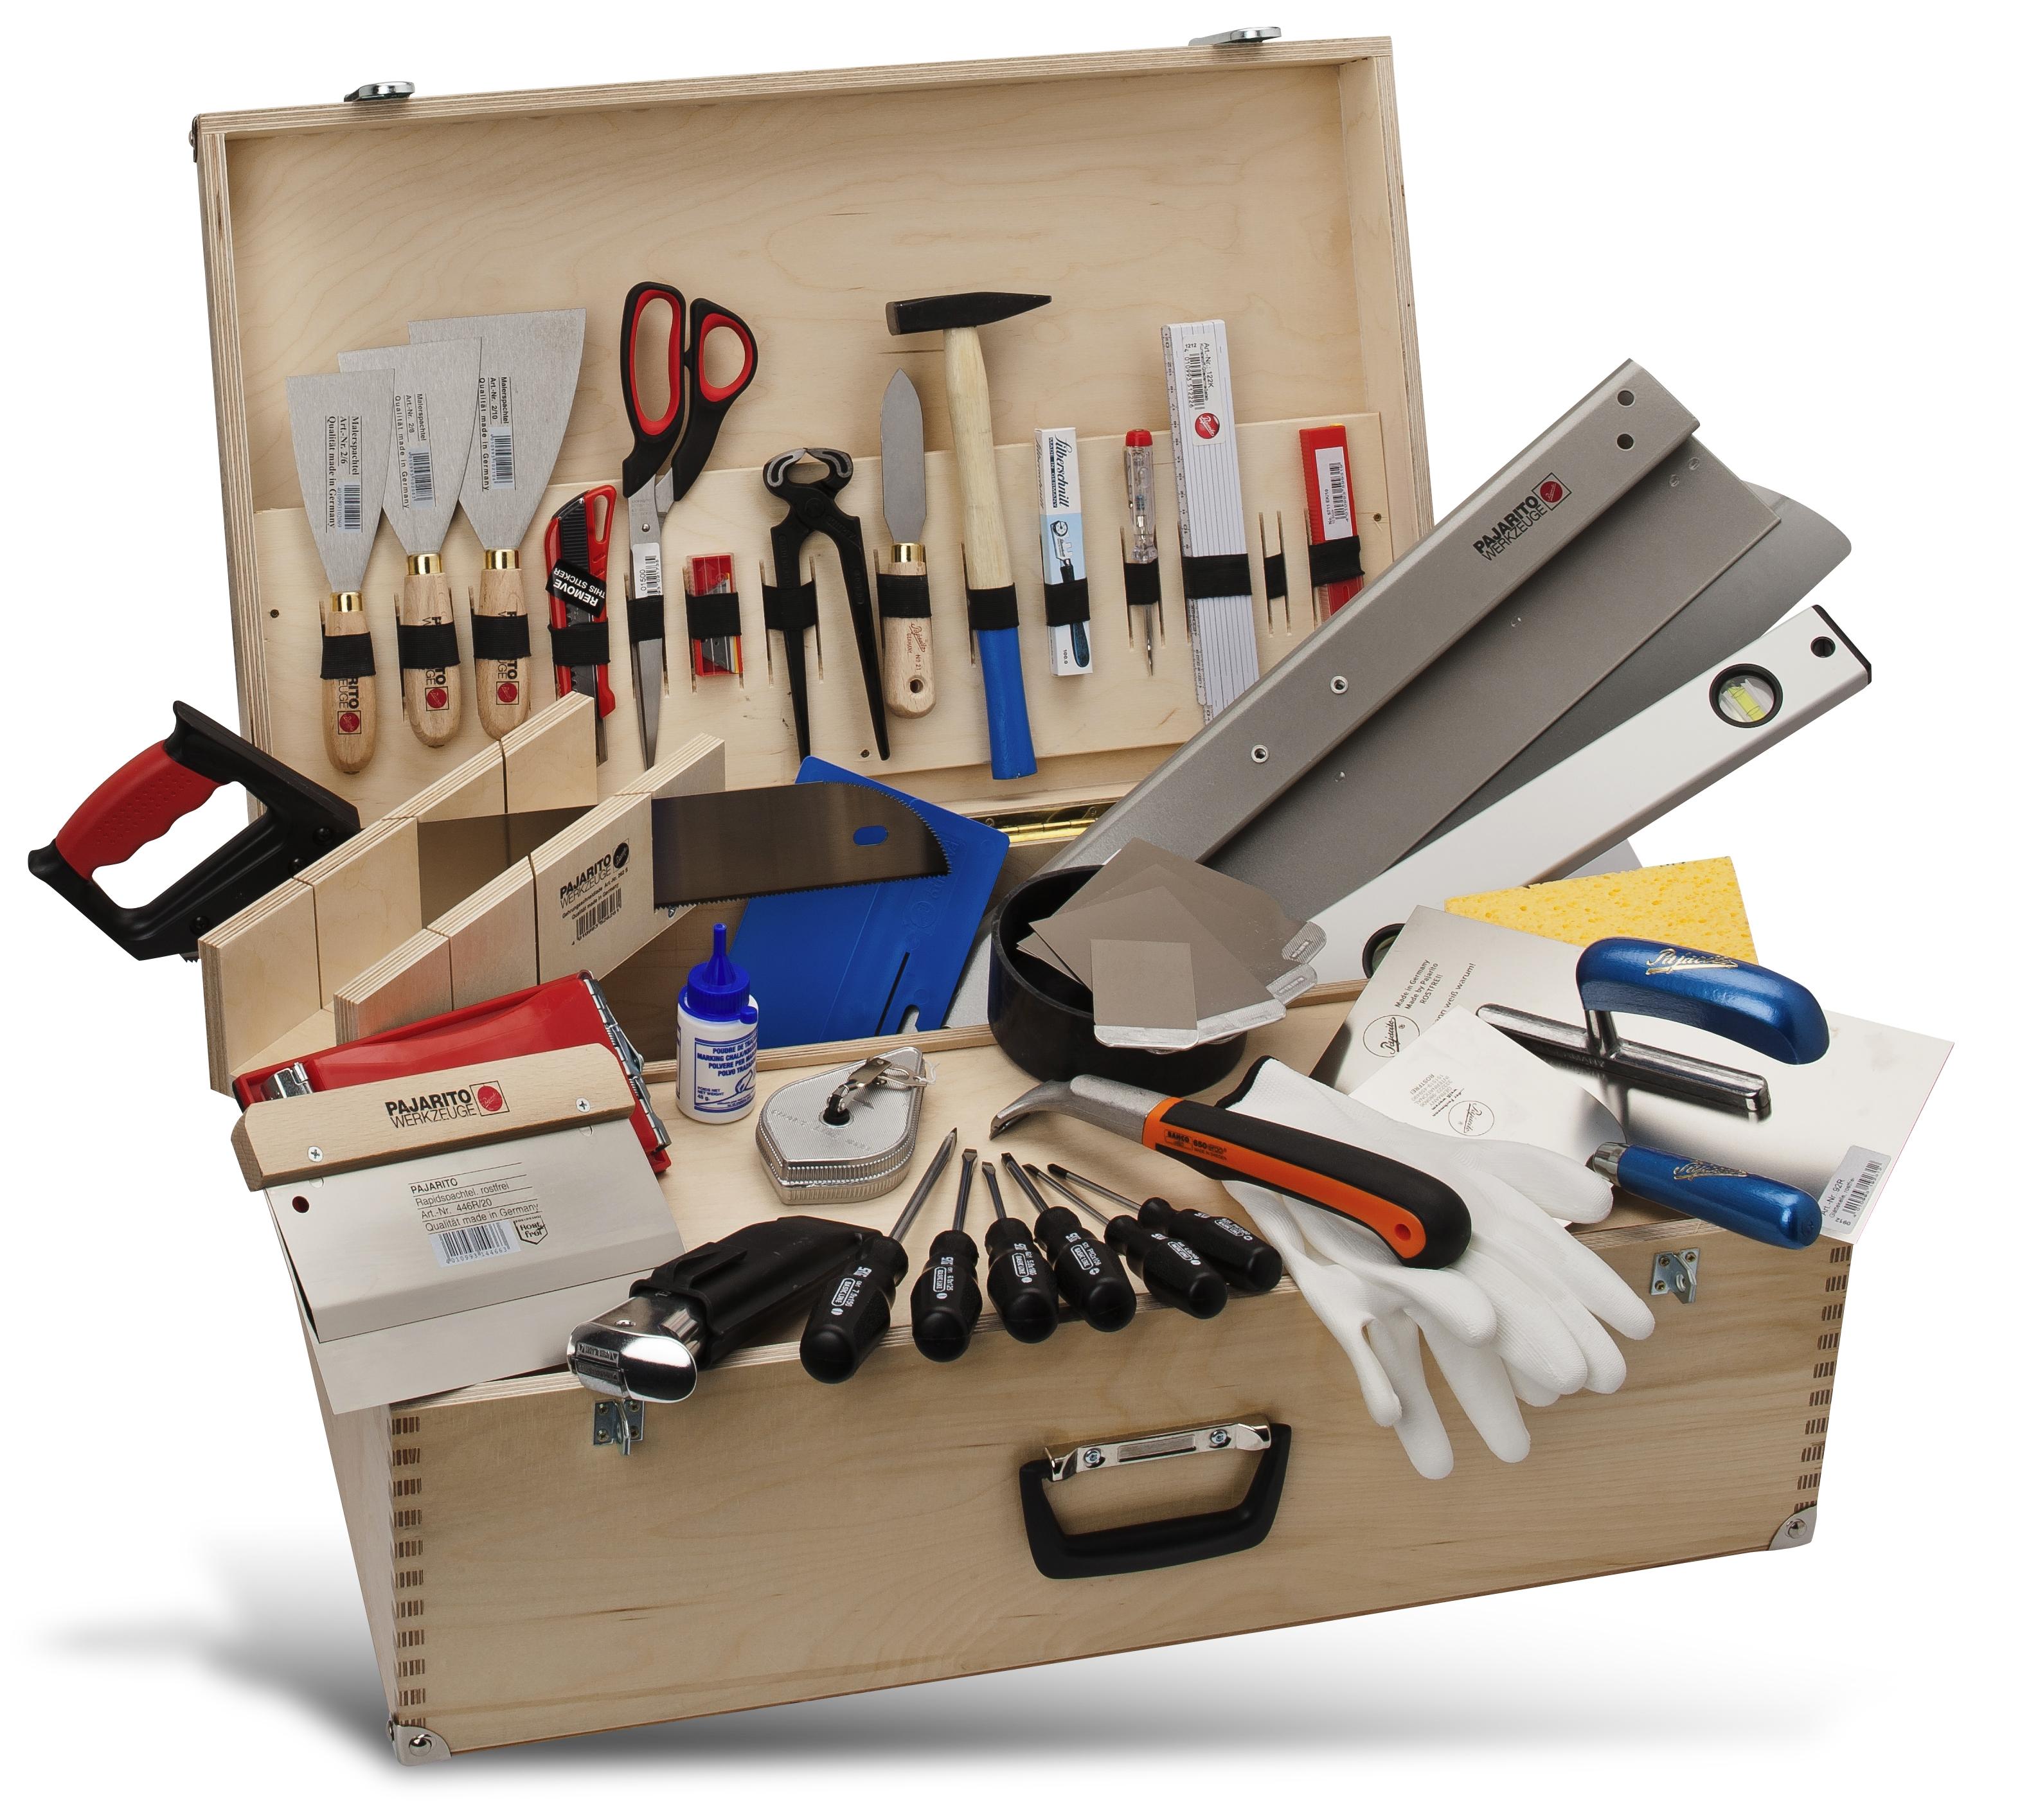 Werkzeugkasten leer Pajarito